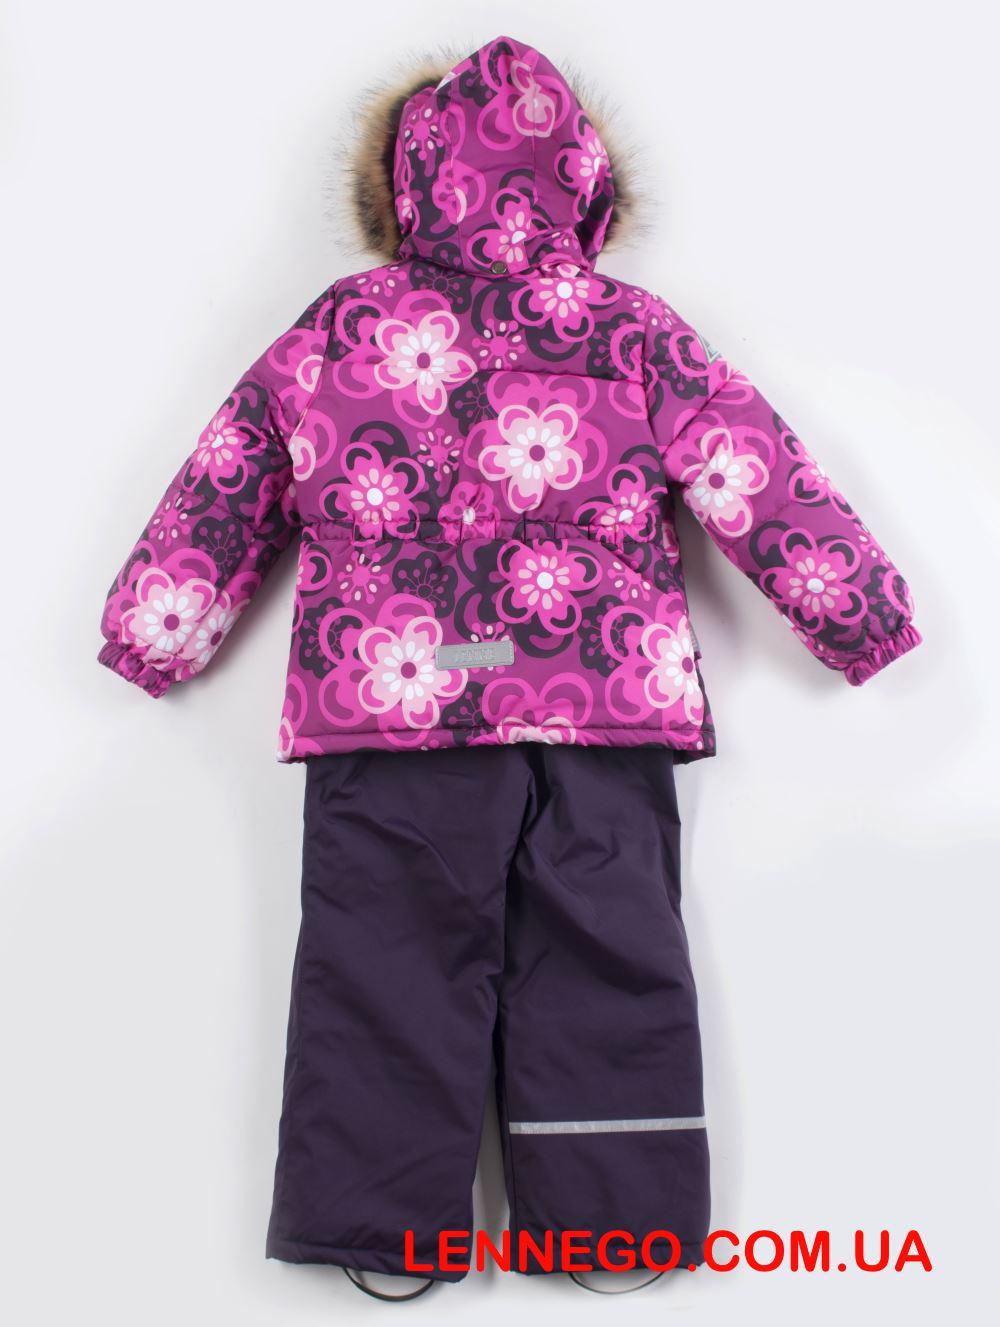 Lenne Roosa комплект для девочки